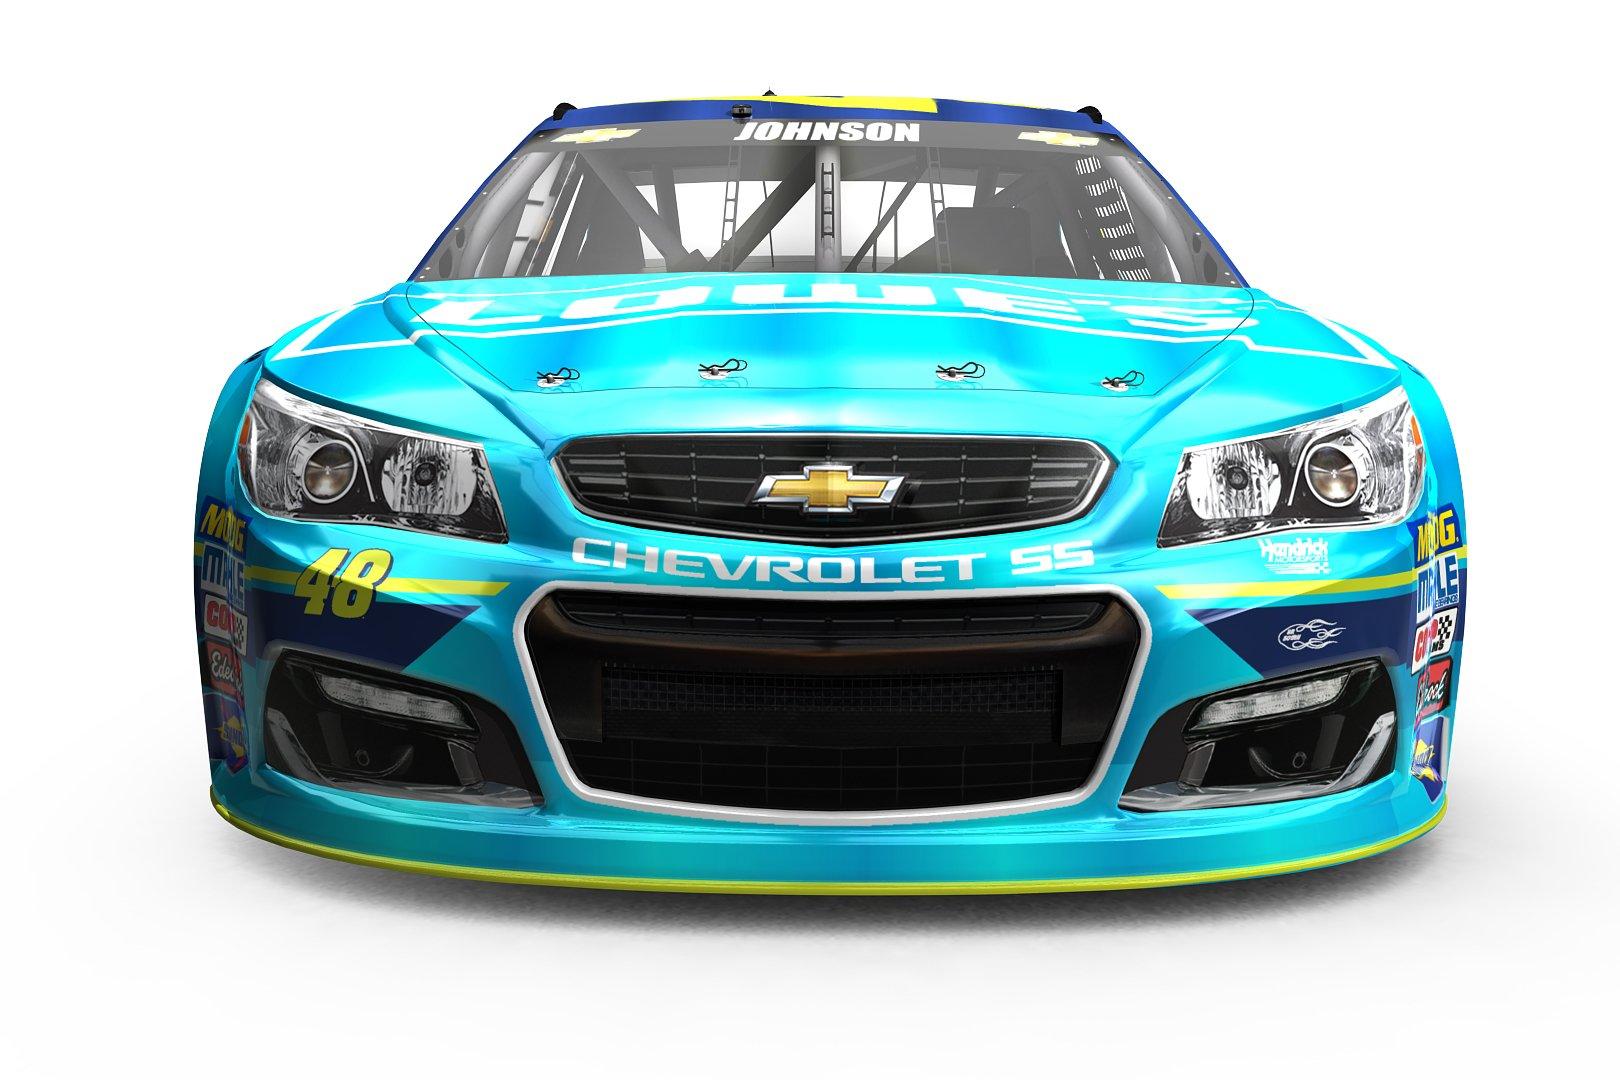 2017 Jimmie Johnson Michigan International Raceway NASCAR paint scheme